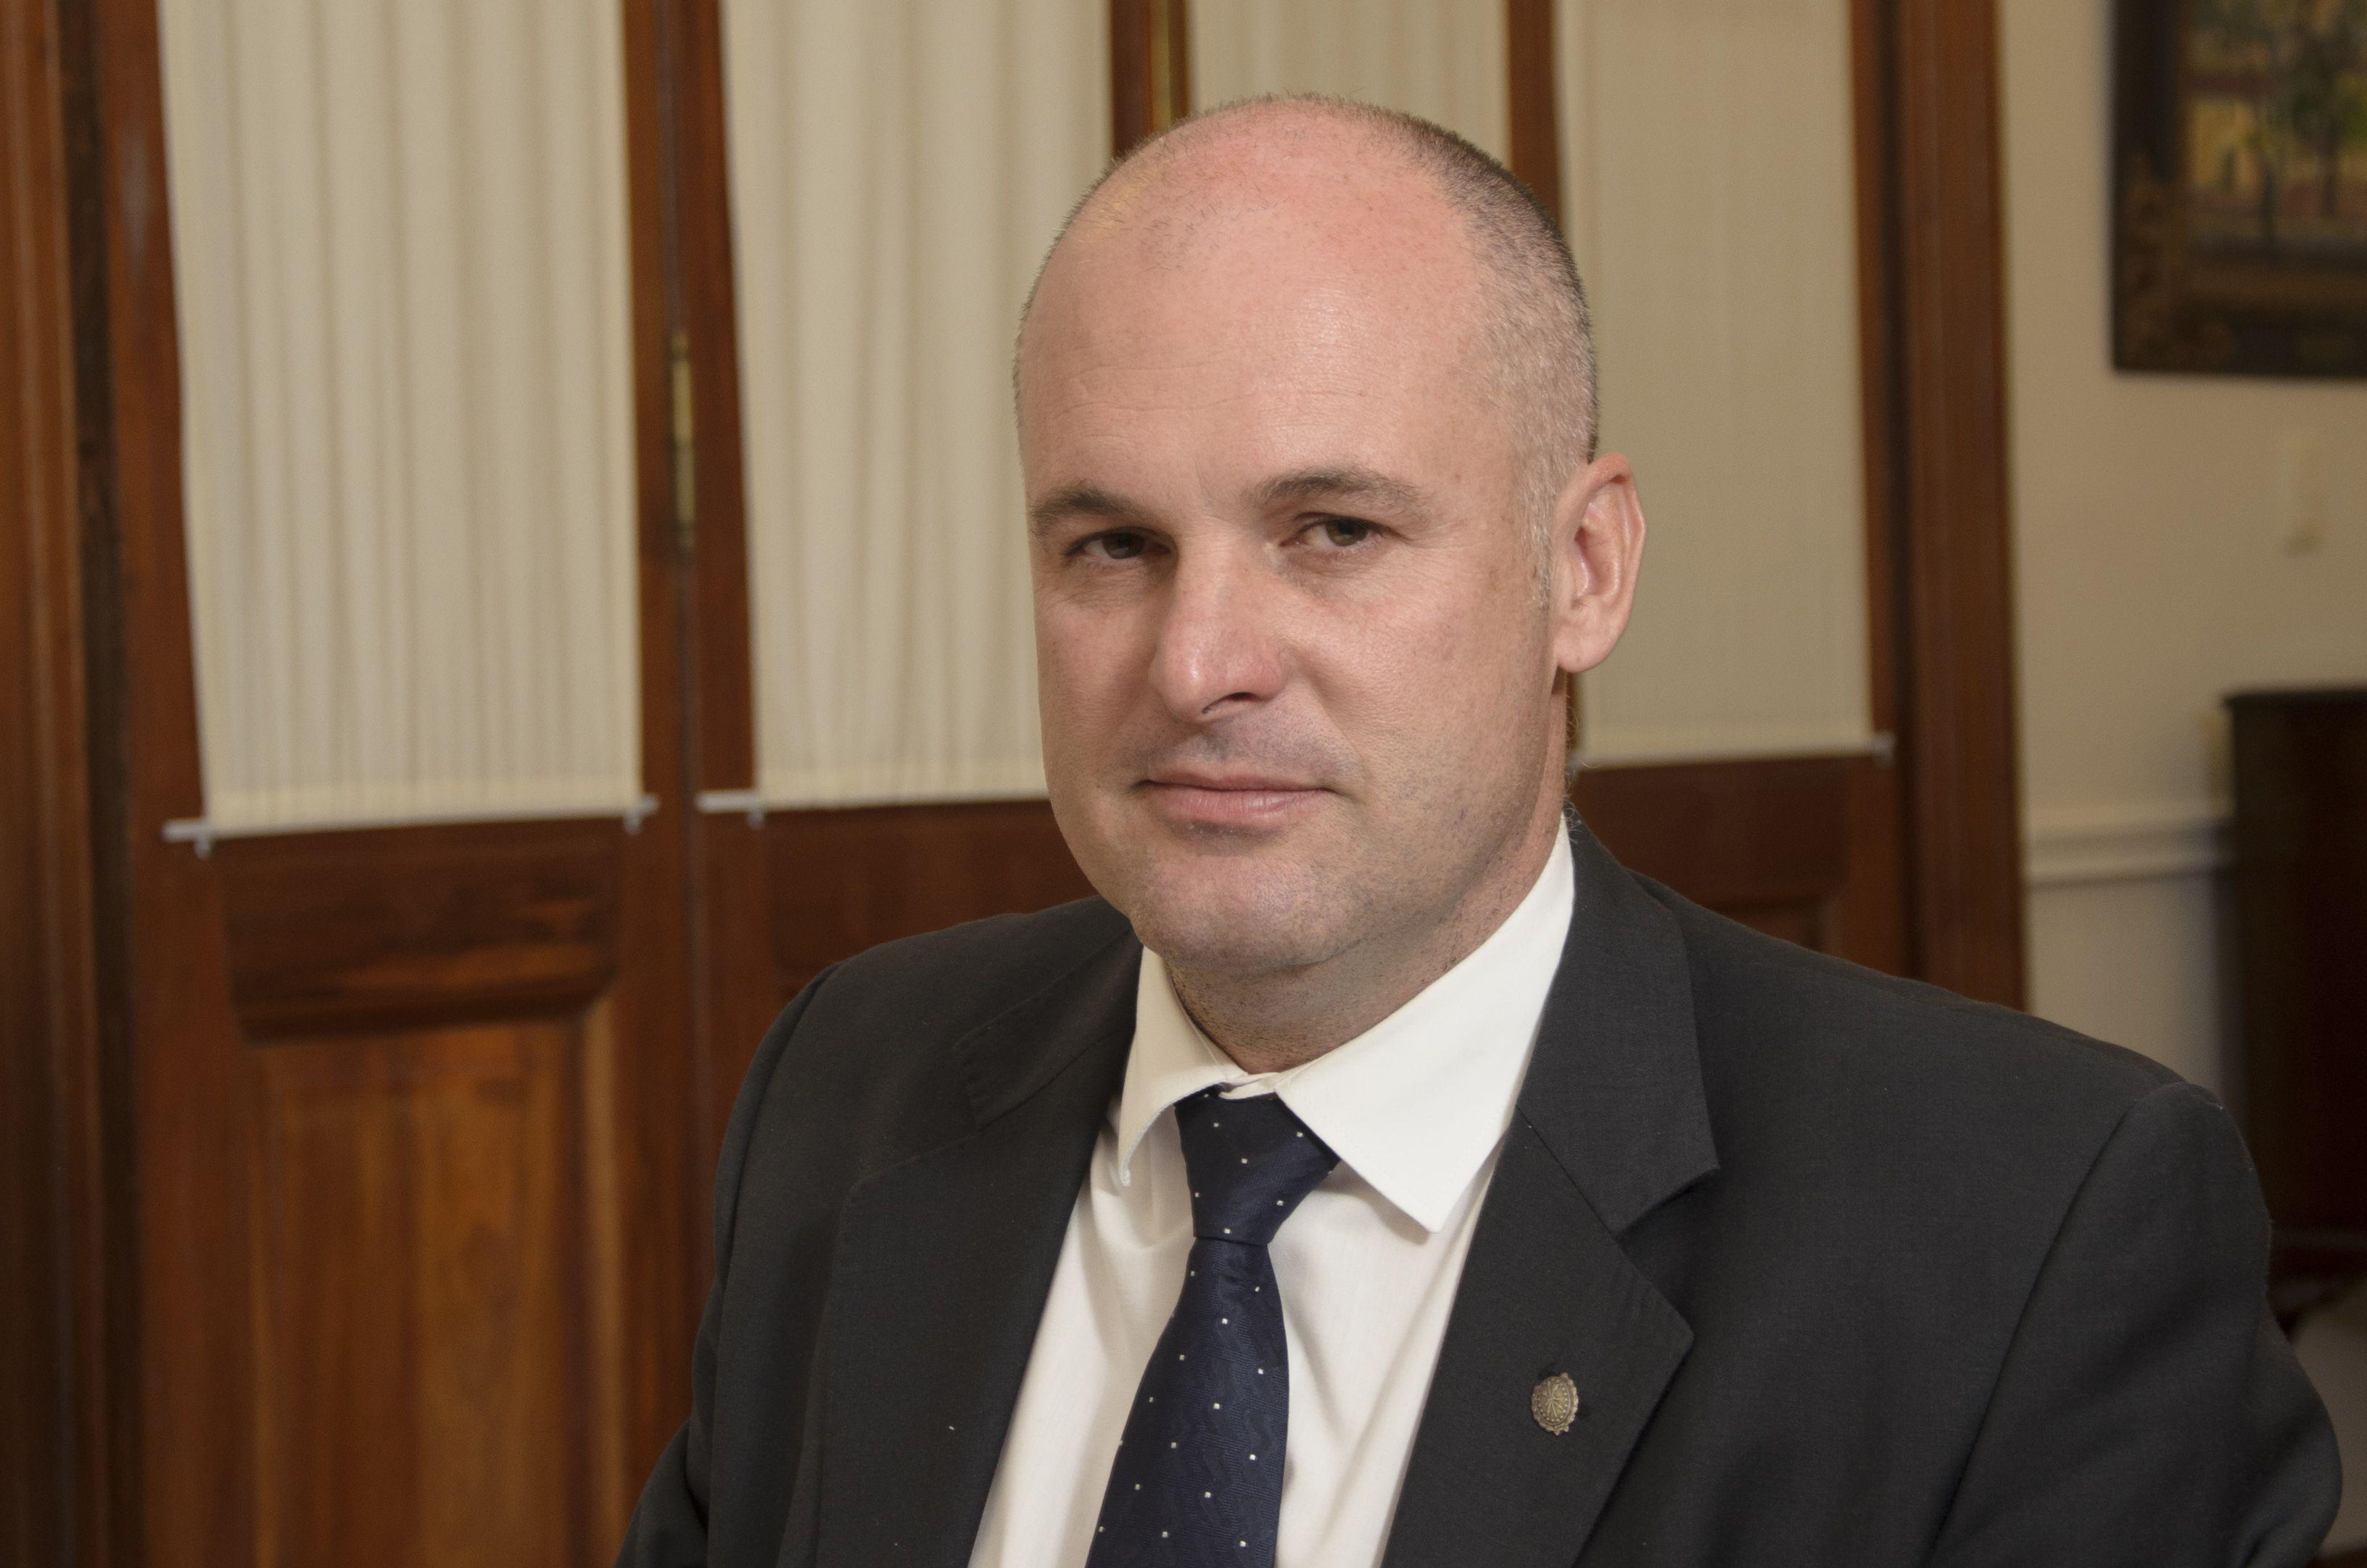 El vicegobernador Jorge Henn respondió con dureza a Ganón.